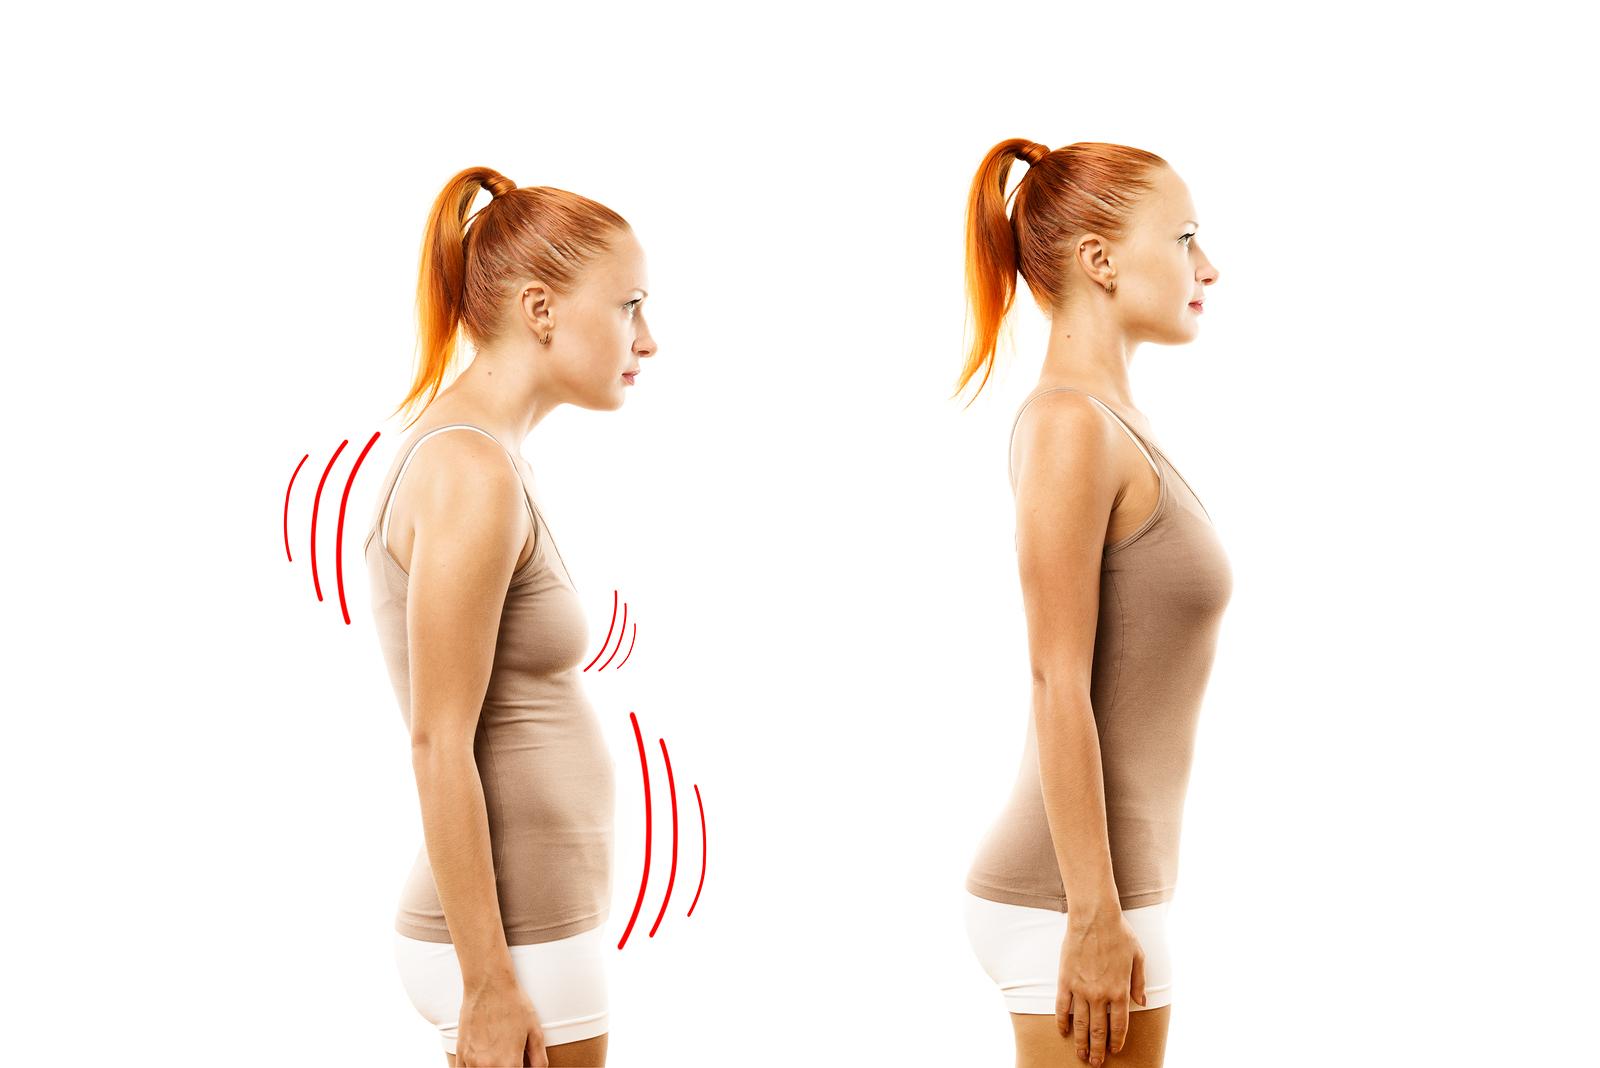 Posture & Muscle Balance